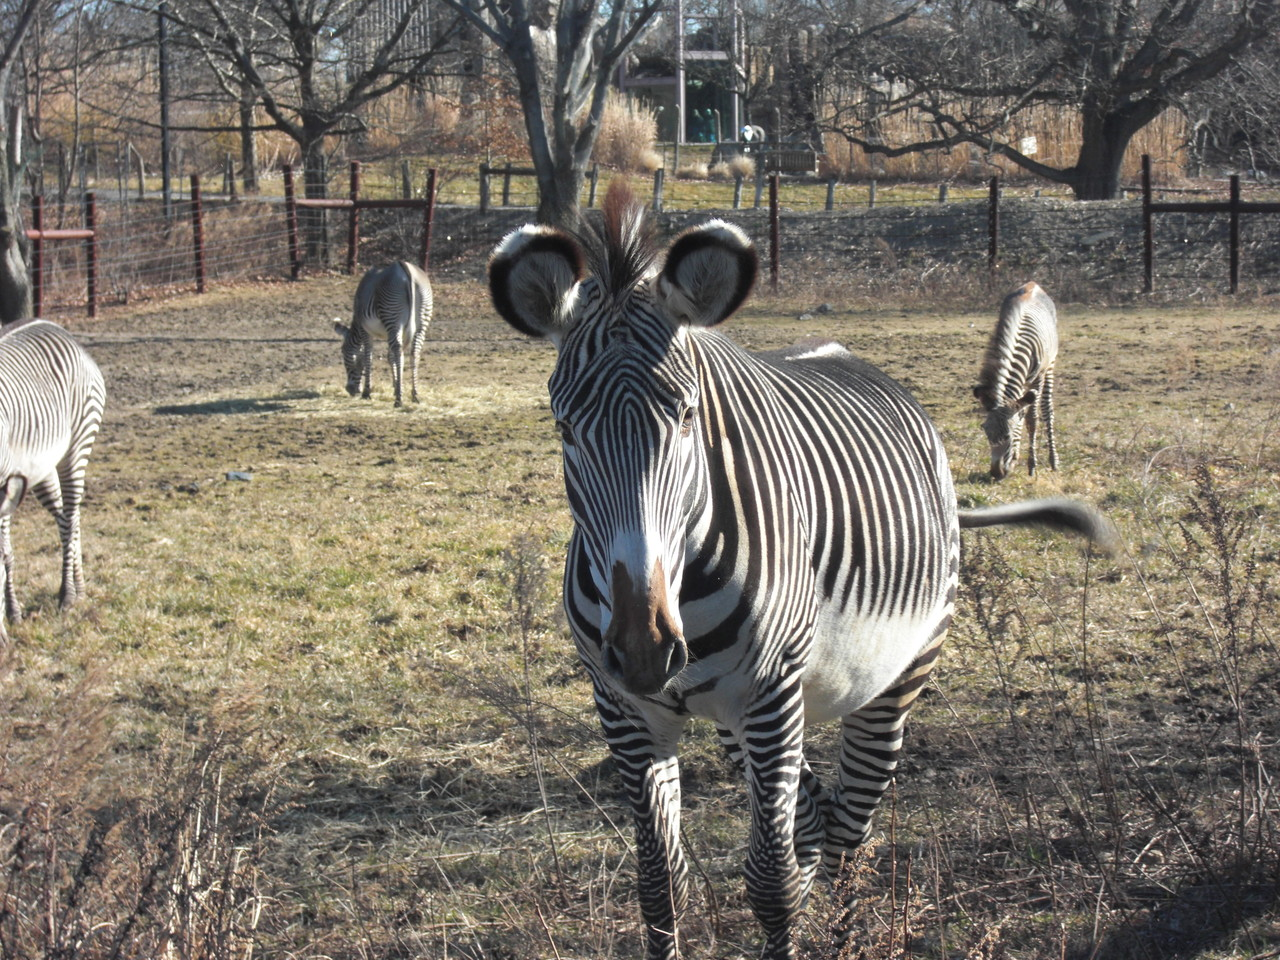 Zebras - Franklin Park Zoo - Umgebung Boston